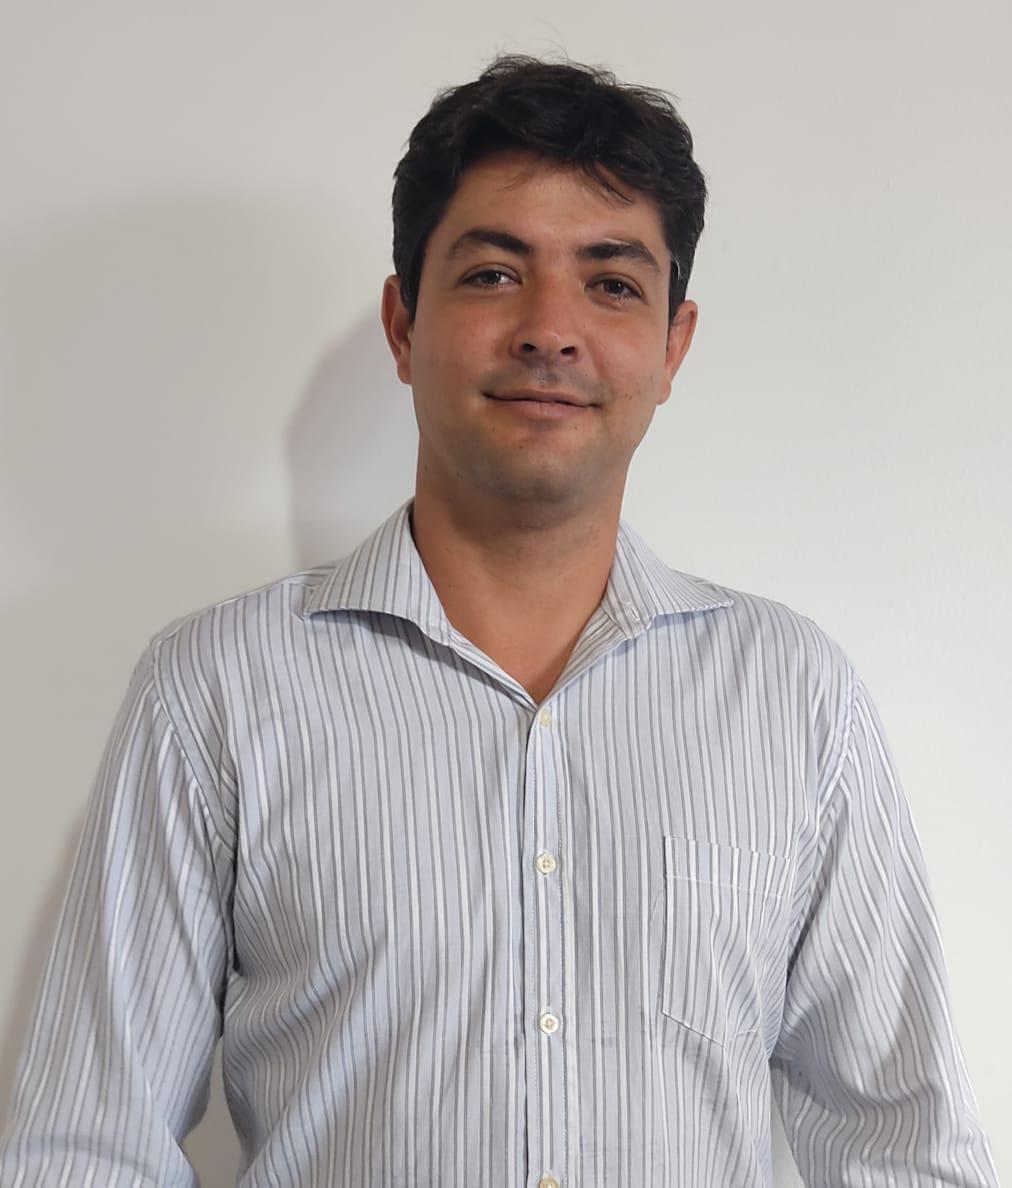 Leandro Carlos Paiva